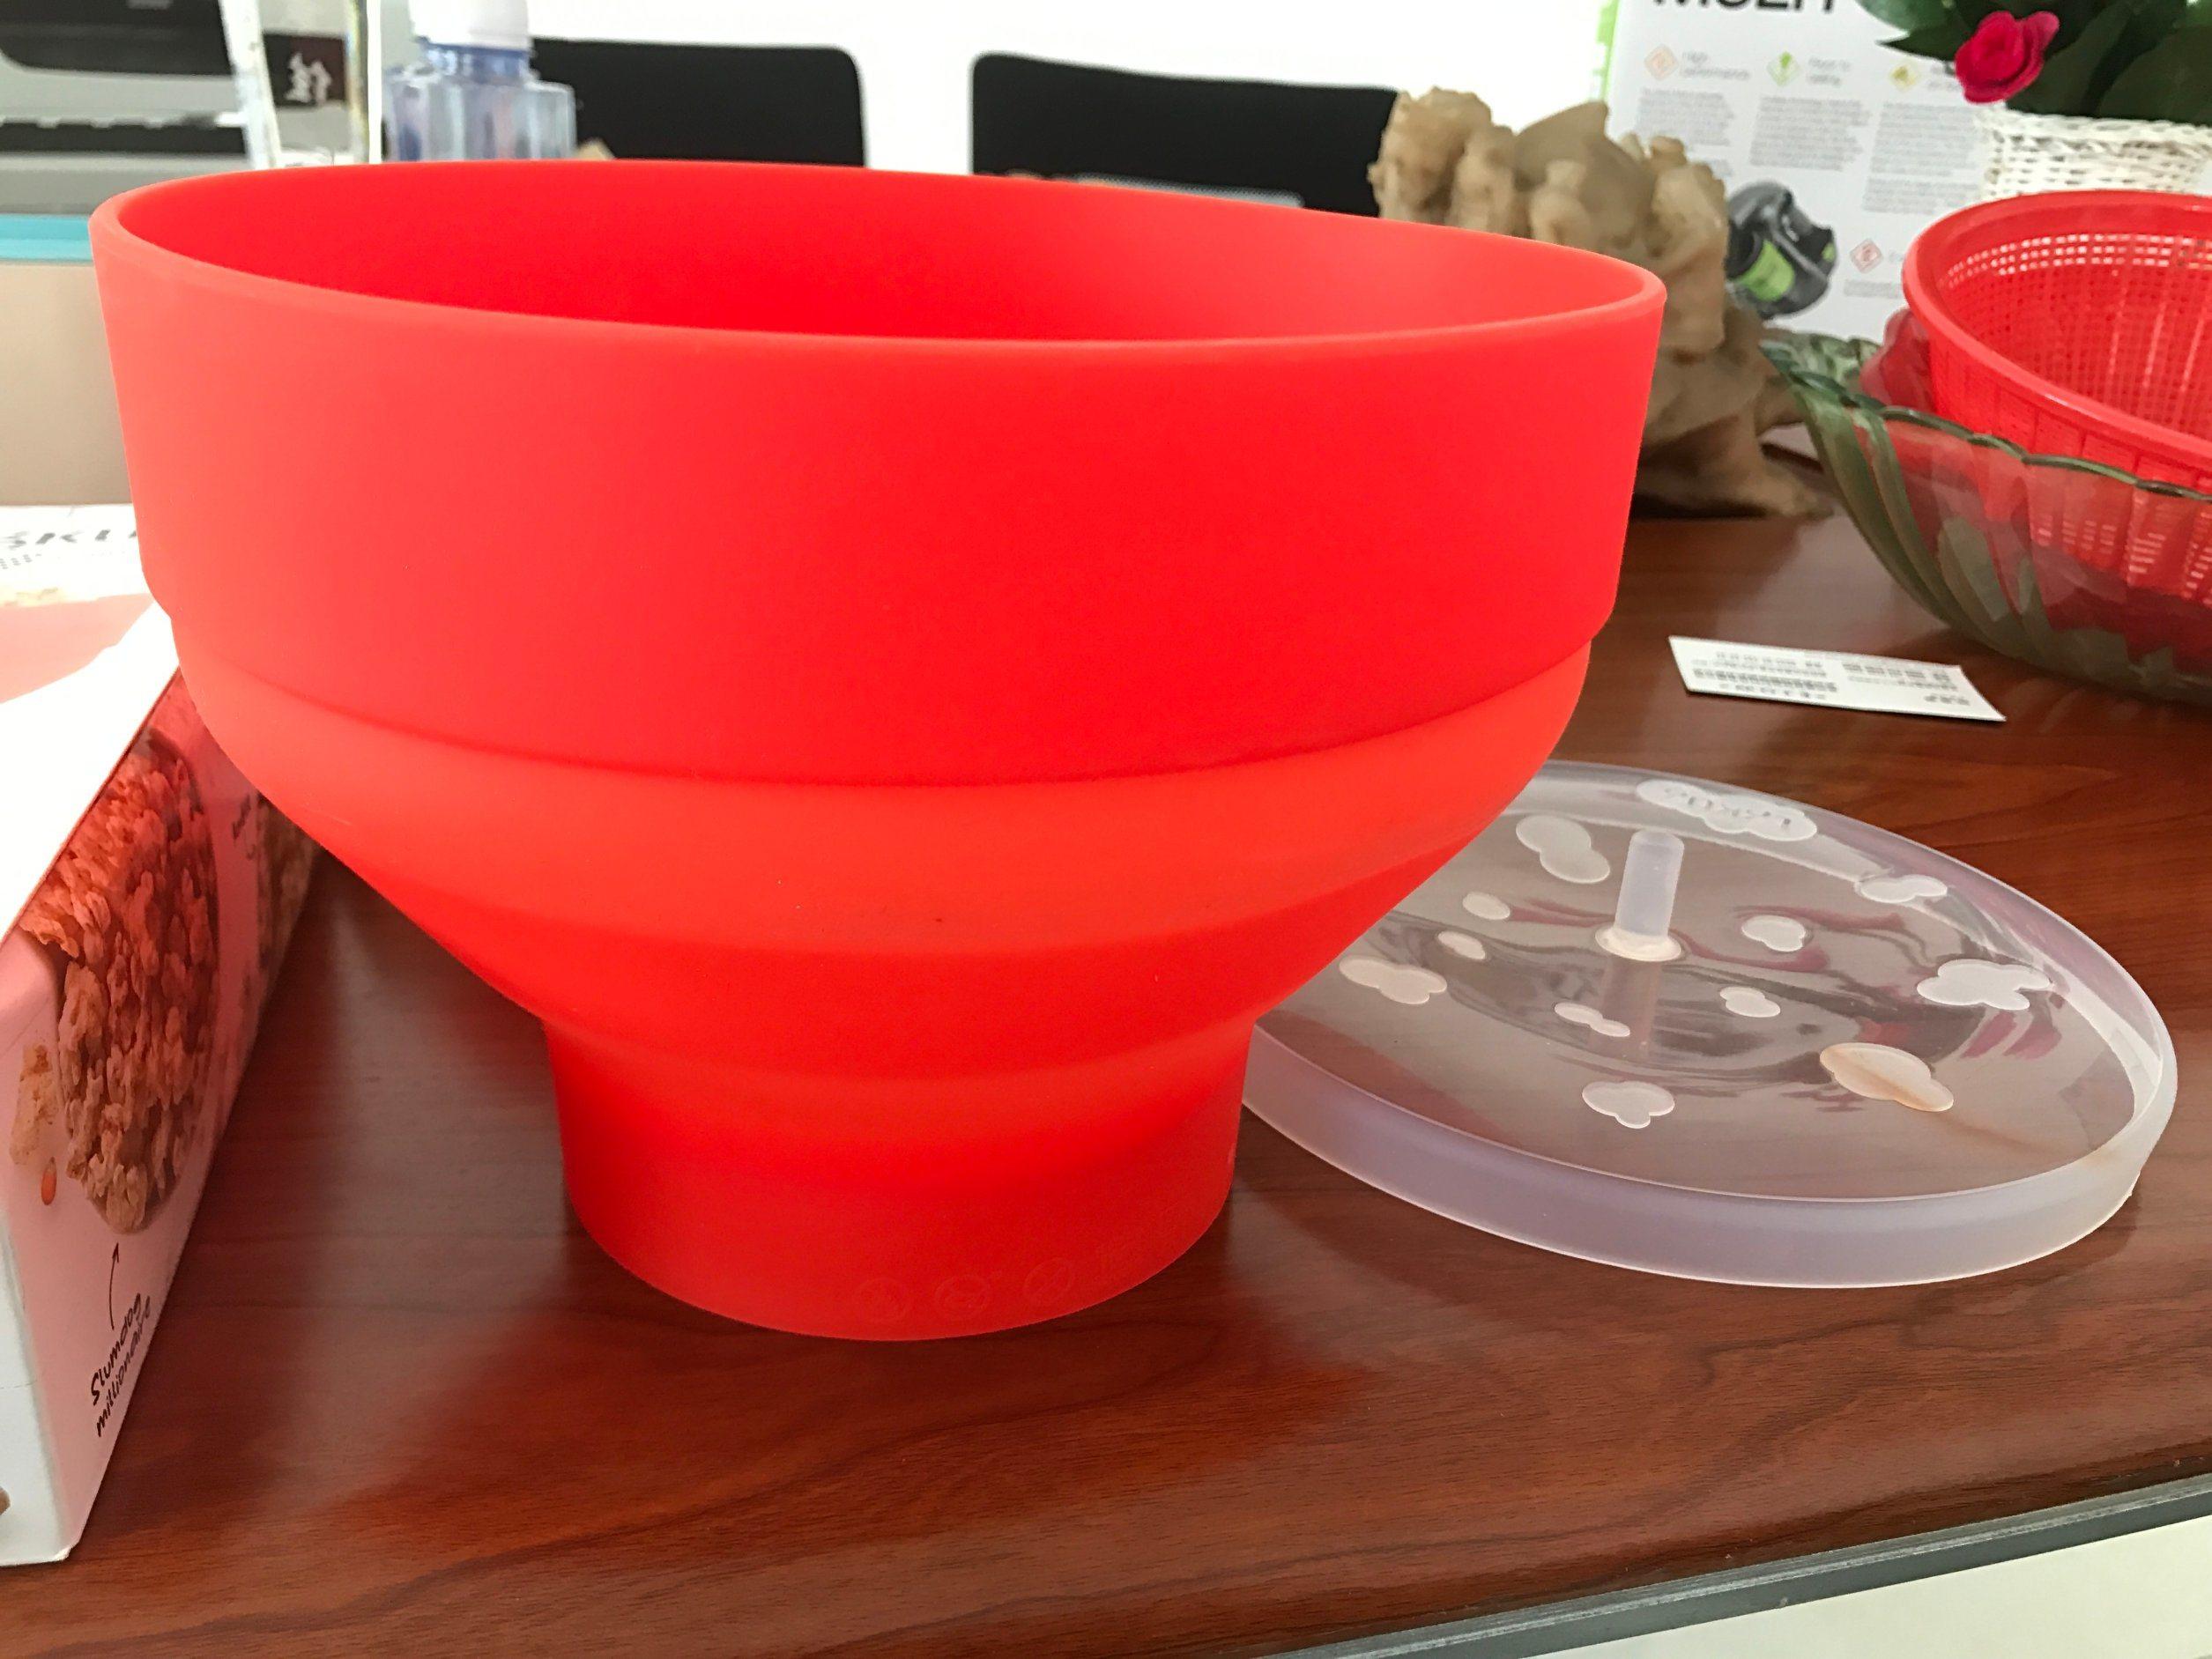 Platinum Silicone Microwave-Safe Plastic Popcorn Container Popcorn Bowl